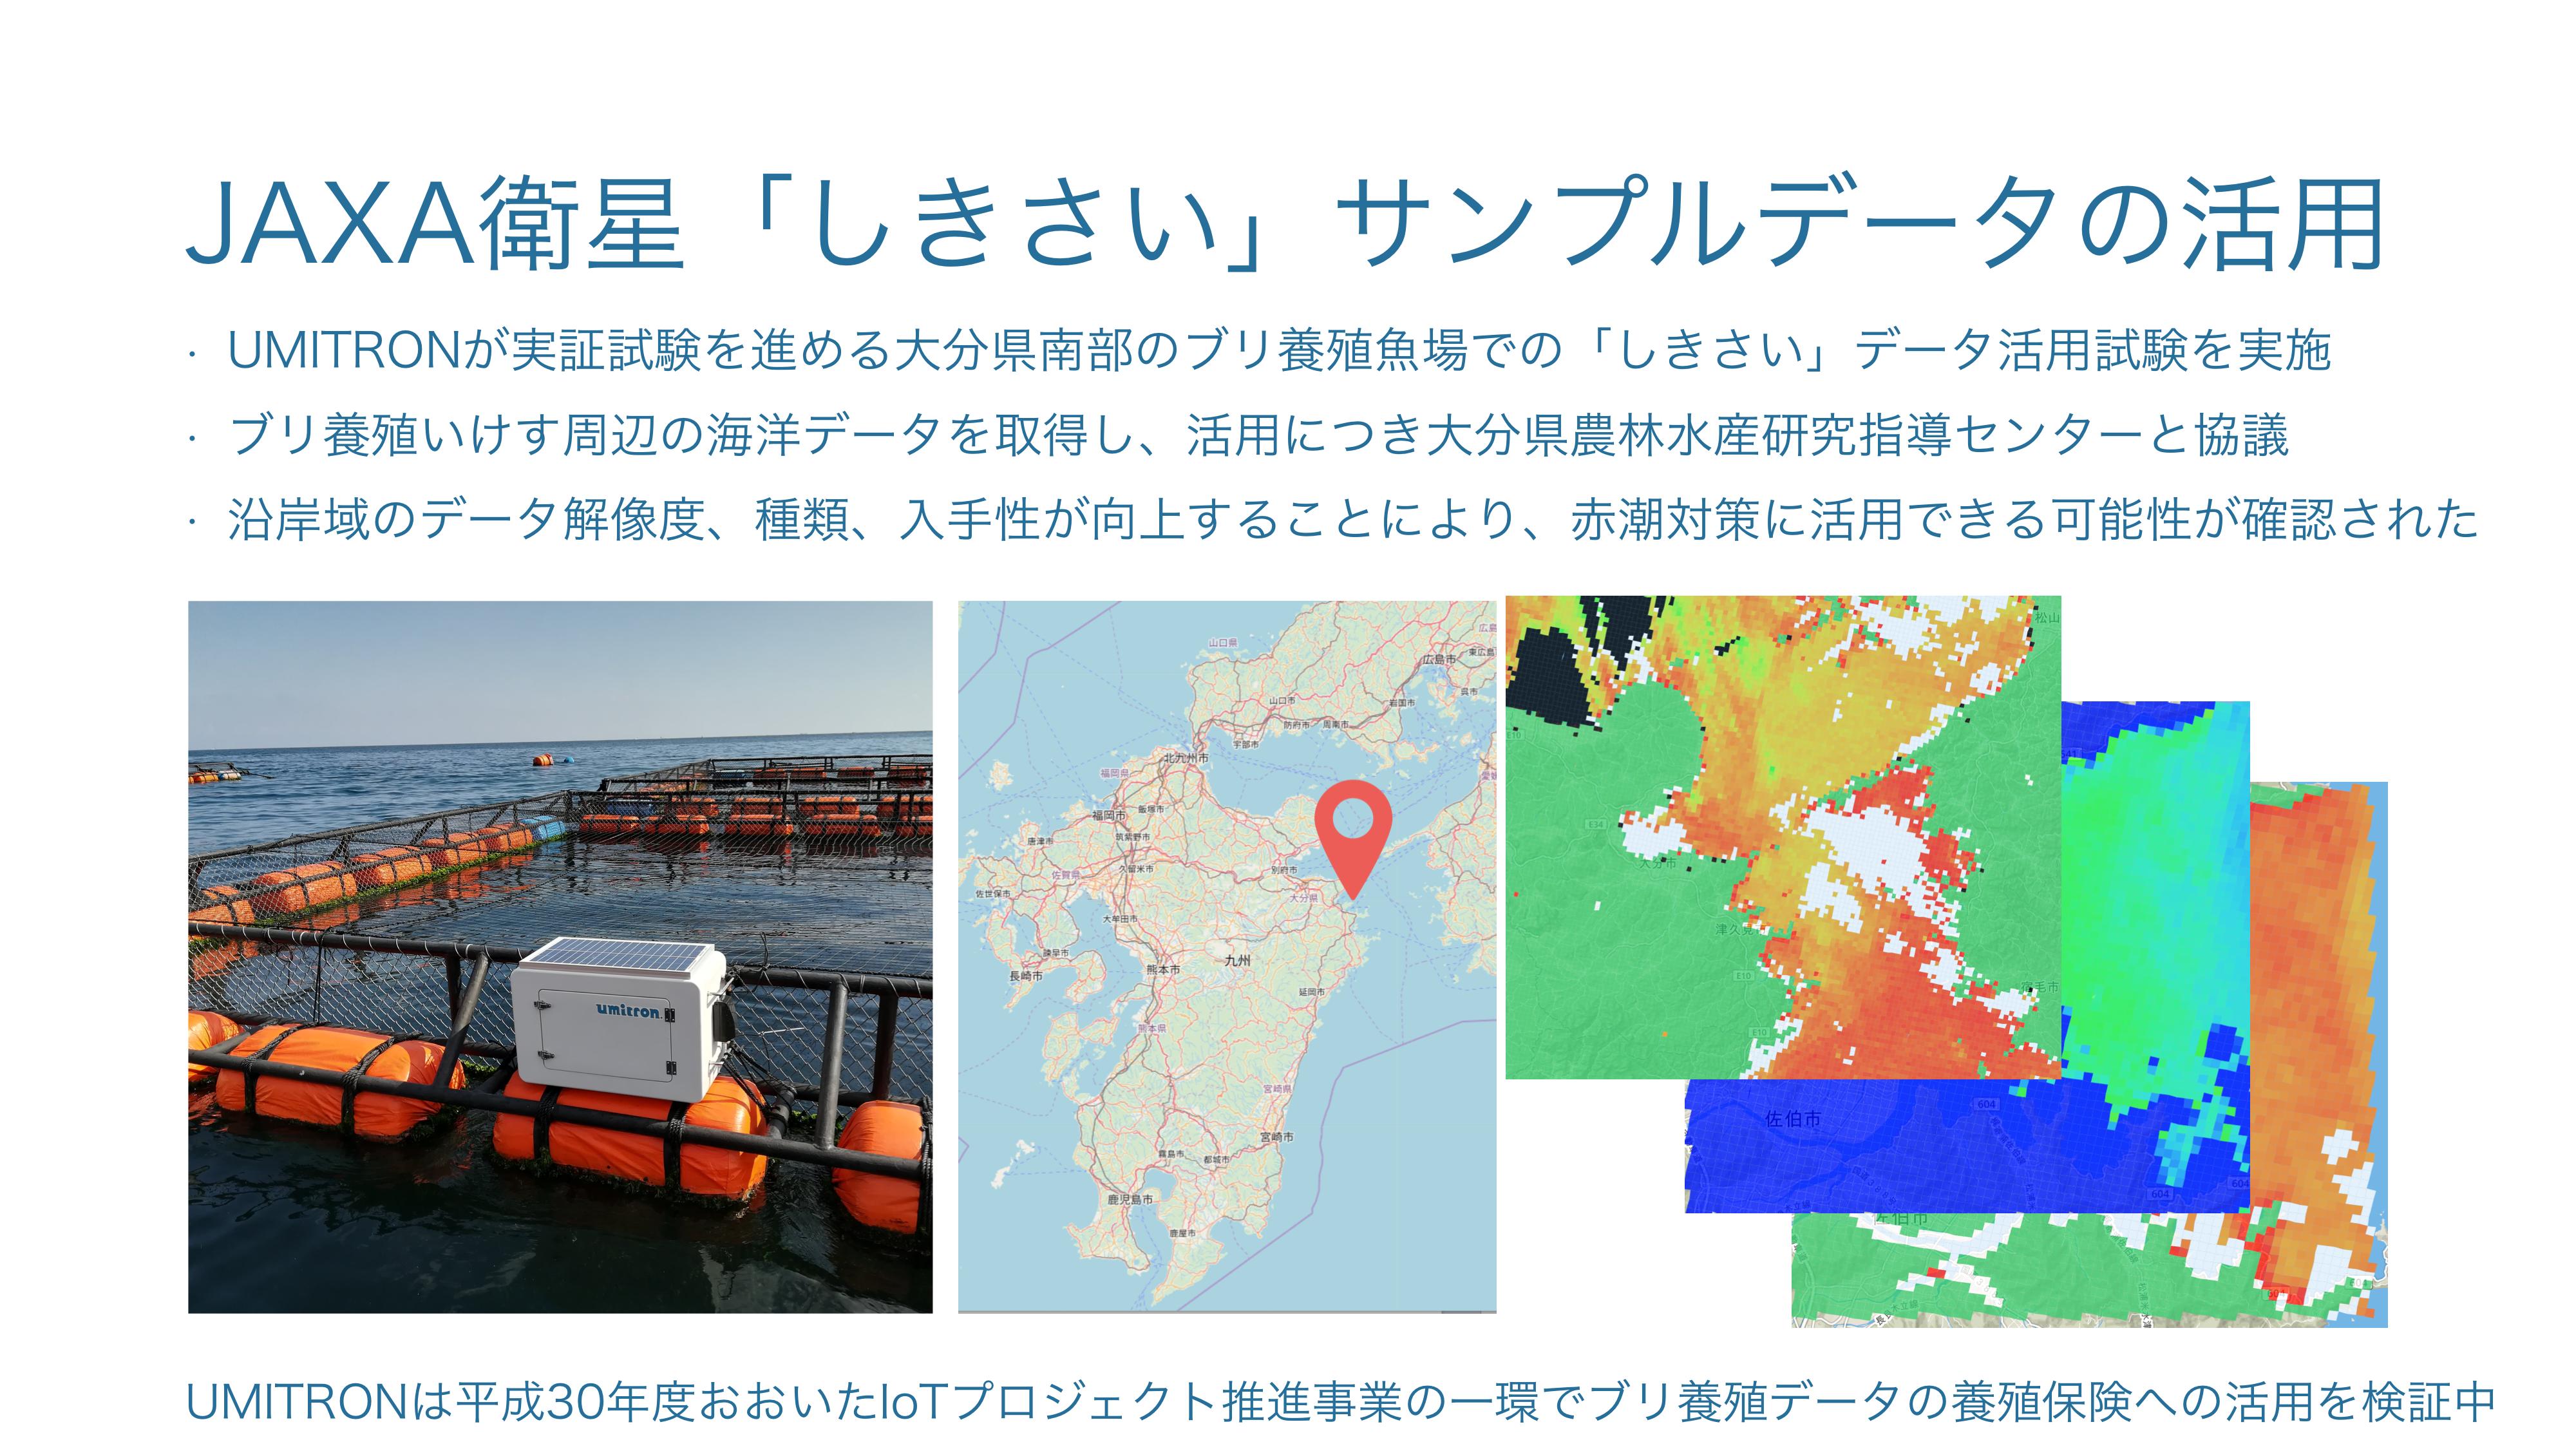 f:id:Imamura:20181220152527p:plain